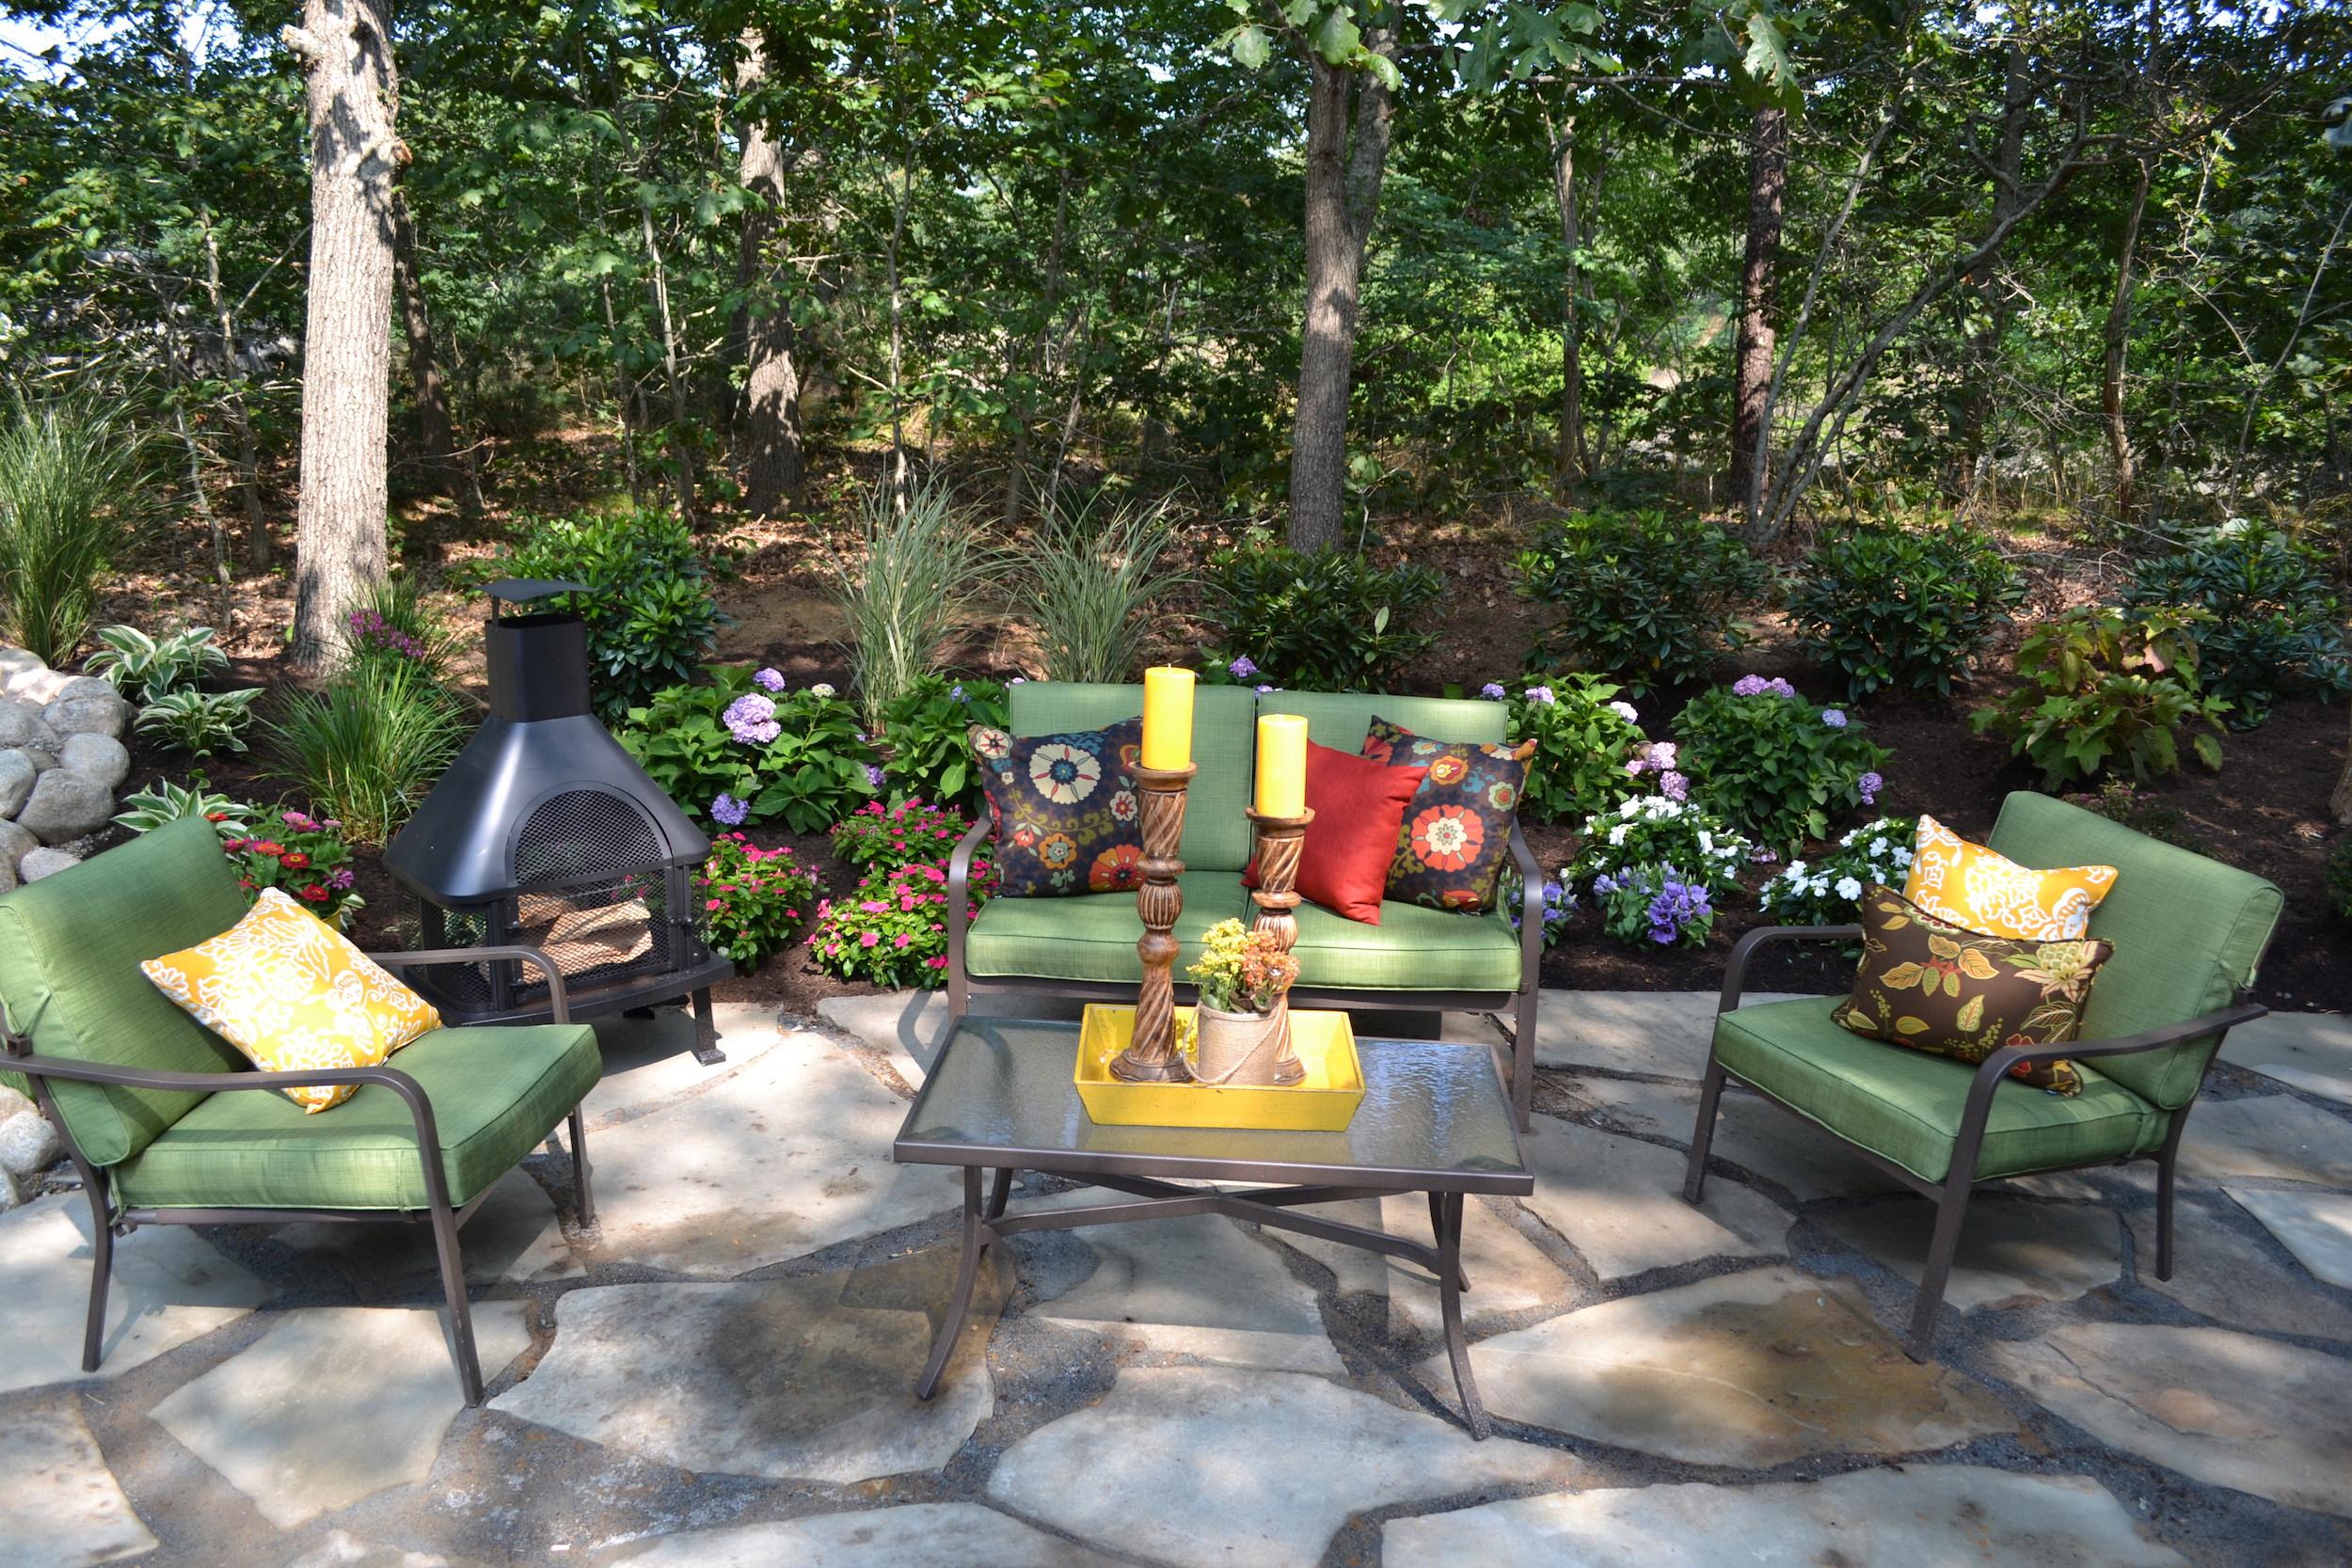 17 Landscaping Ideas For A Low-Maintenance Yard on Low Maintenance Backyard  id=28519